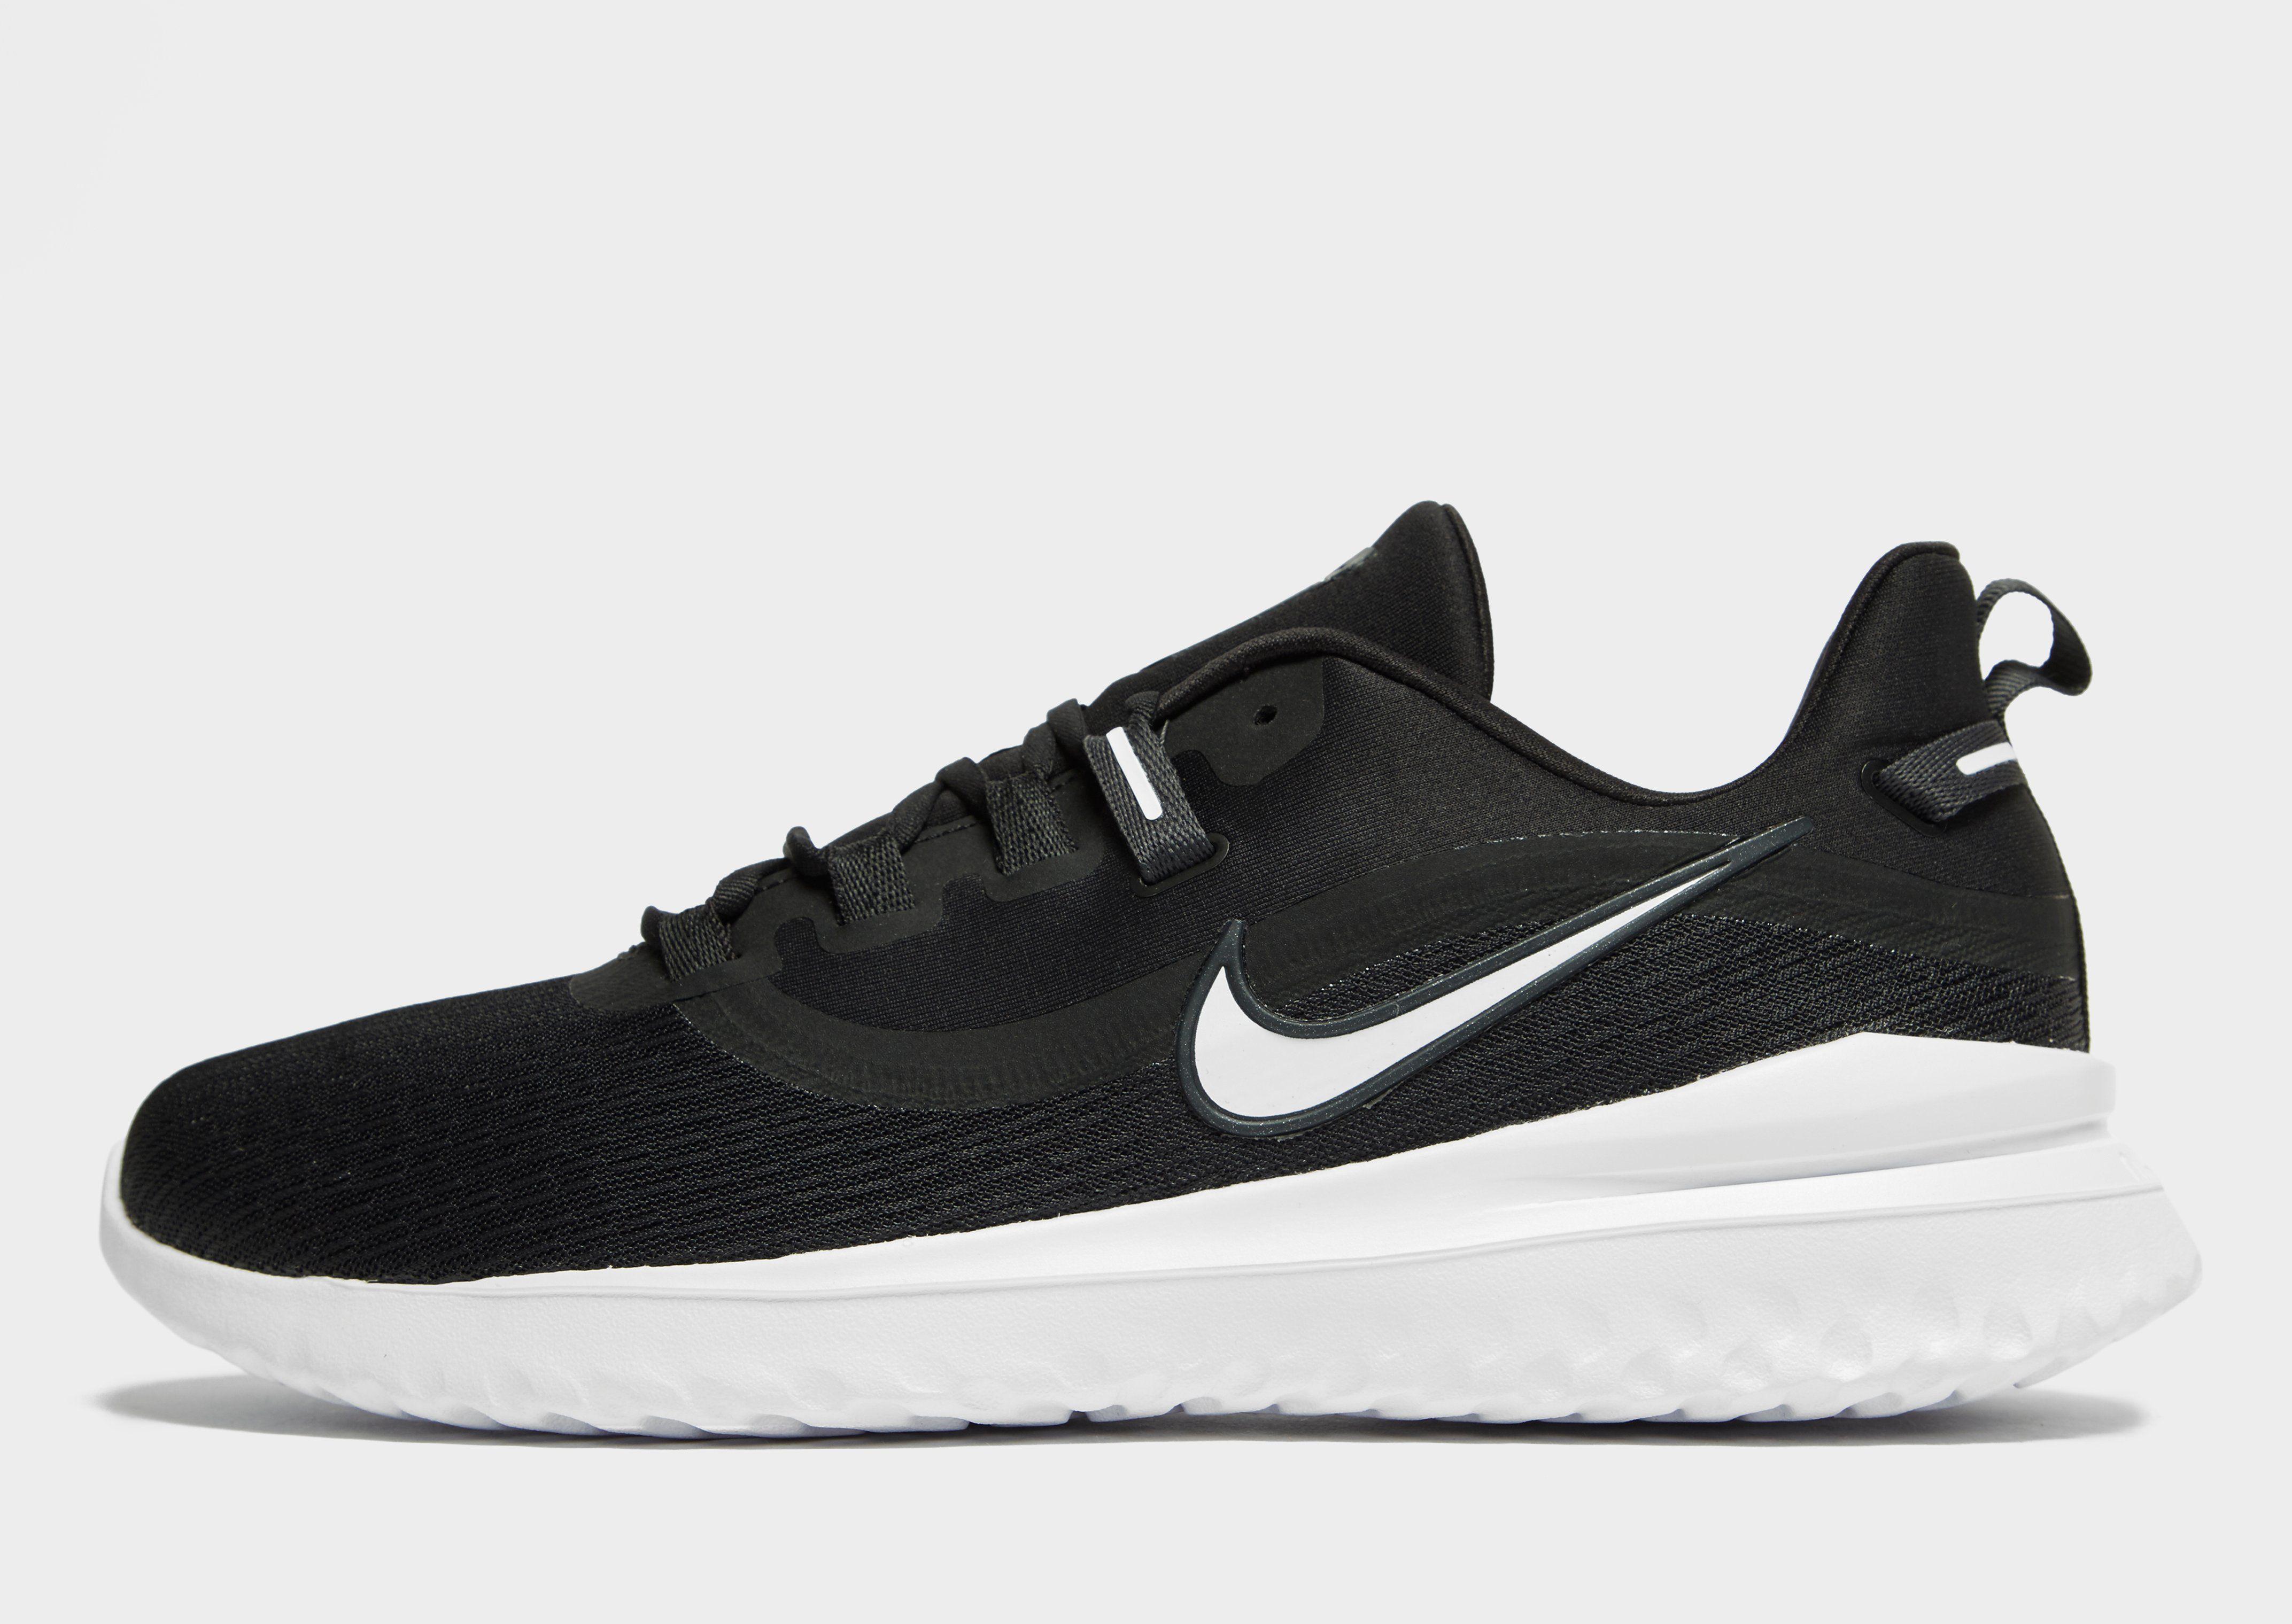 on sale 0bab1 dd2d1 Nike Renew Rival   JD Sports